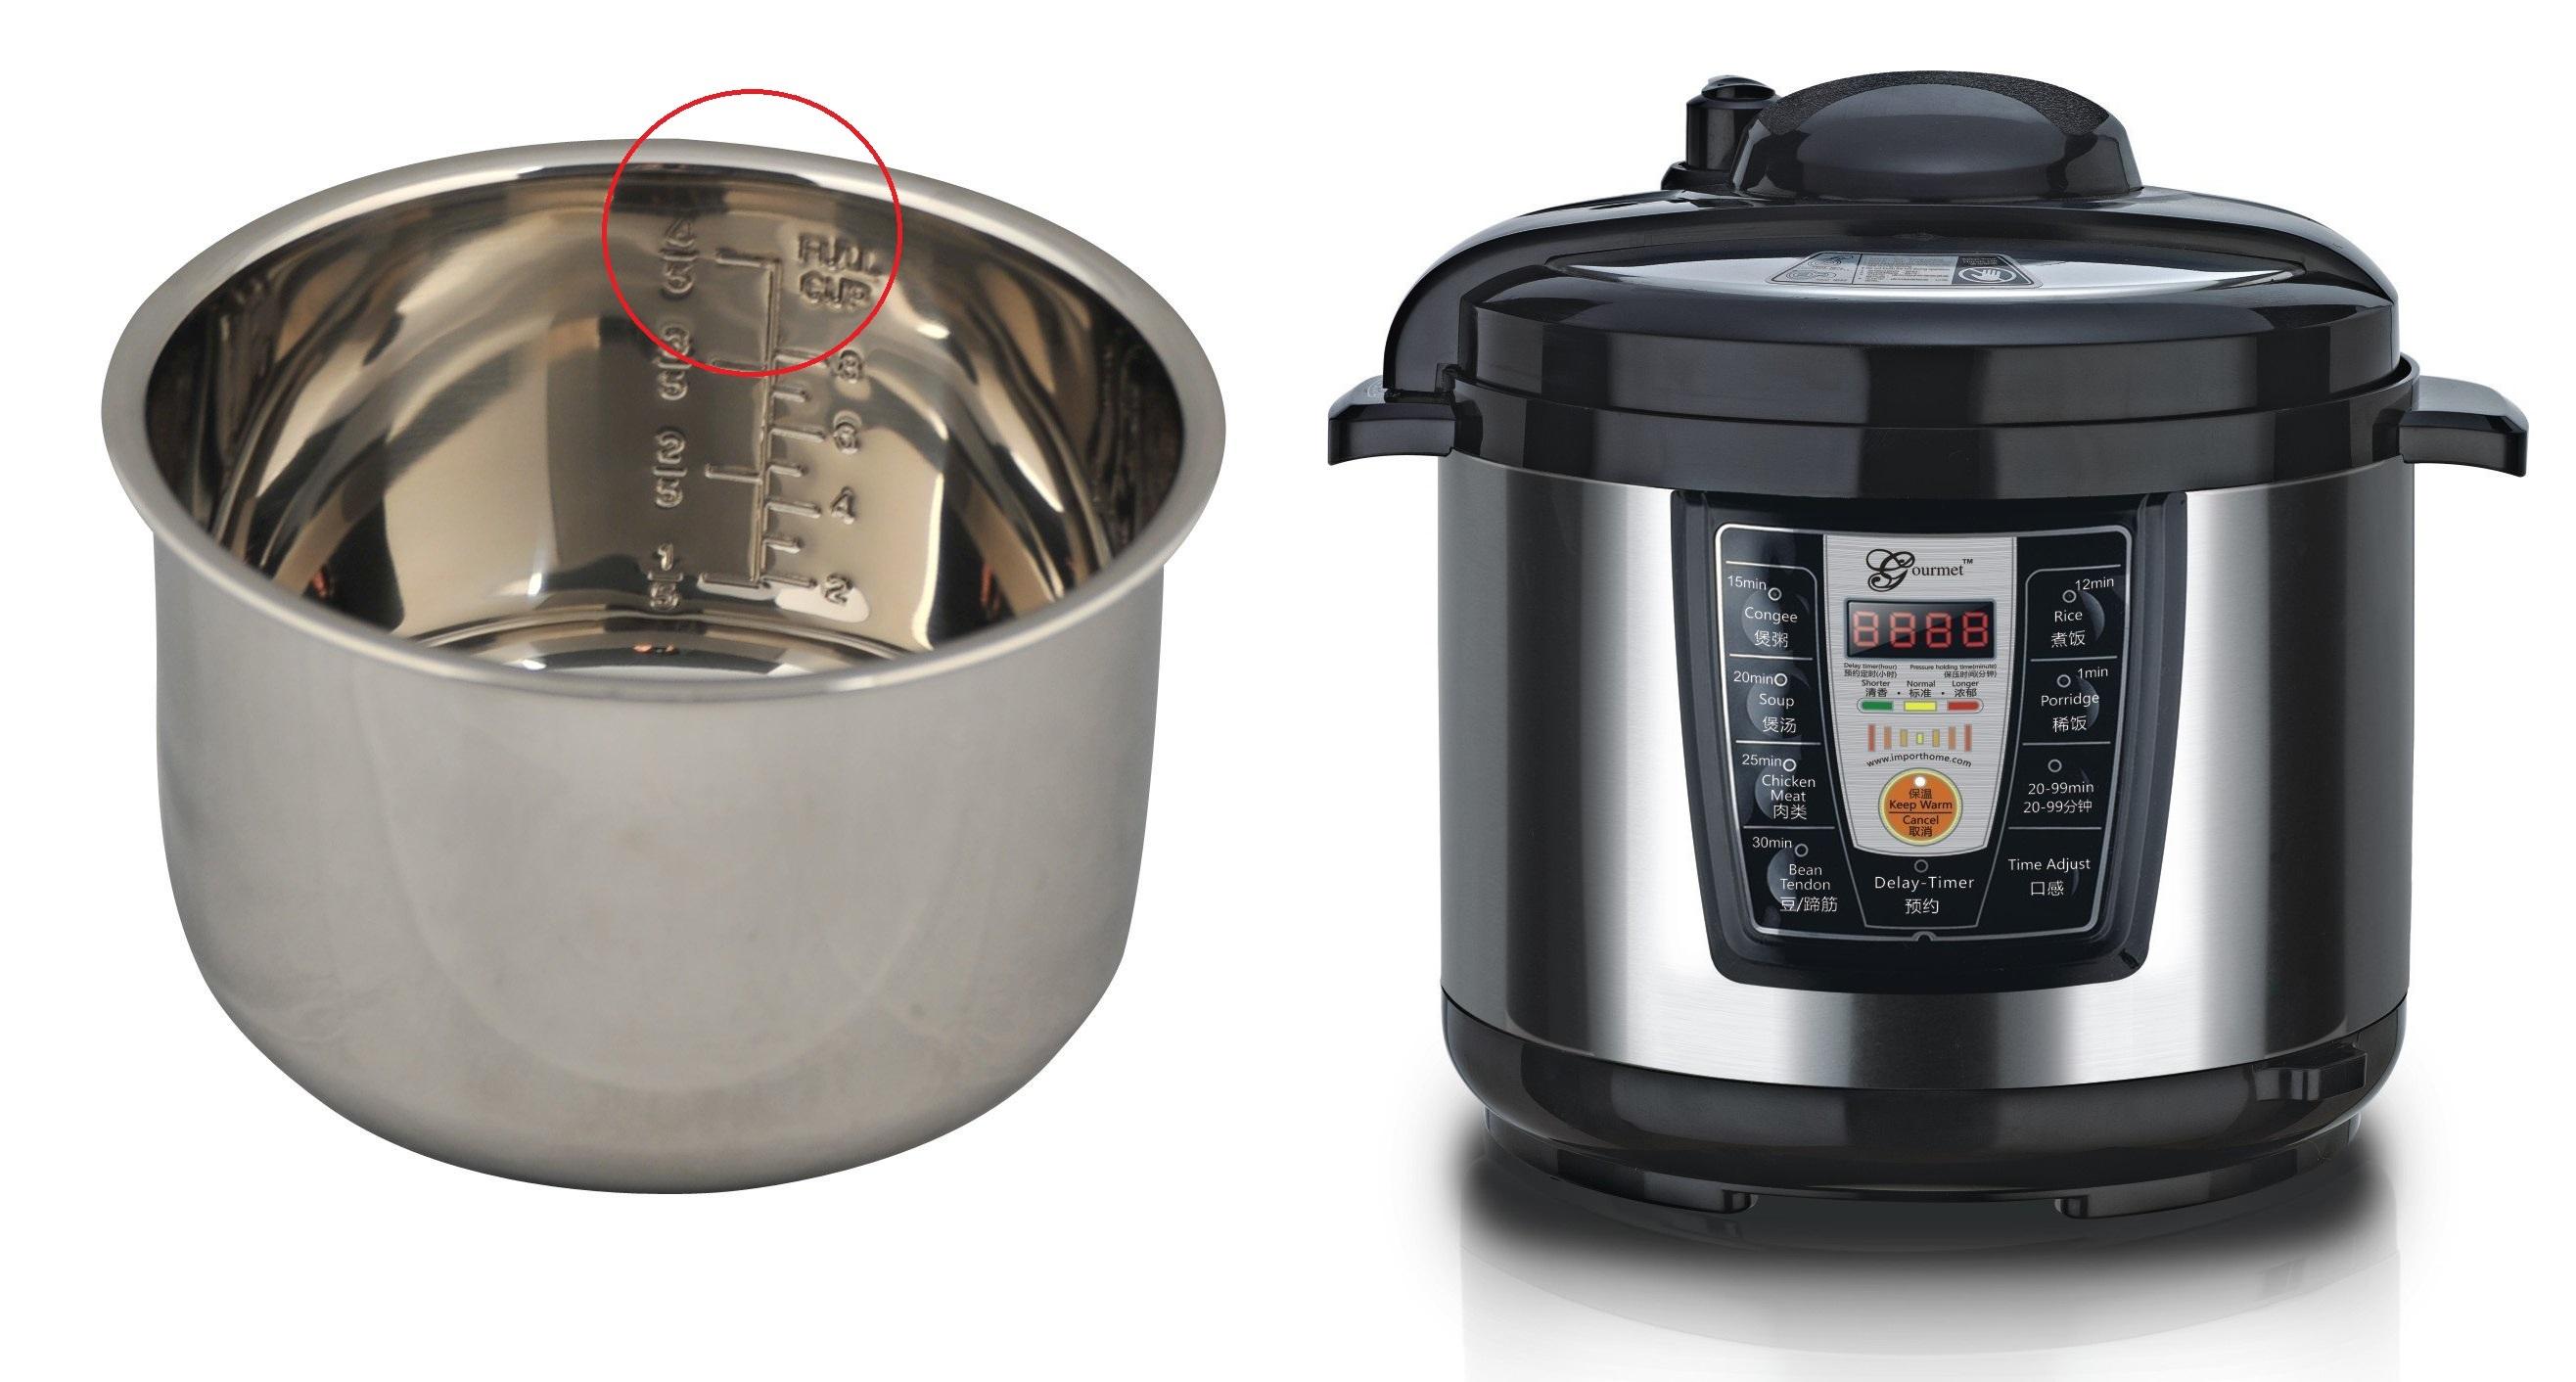 4qt Electric Pressure Cooker Qvc | Lobster House